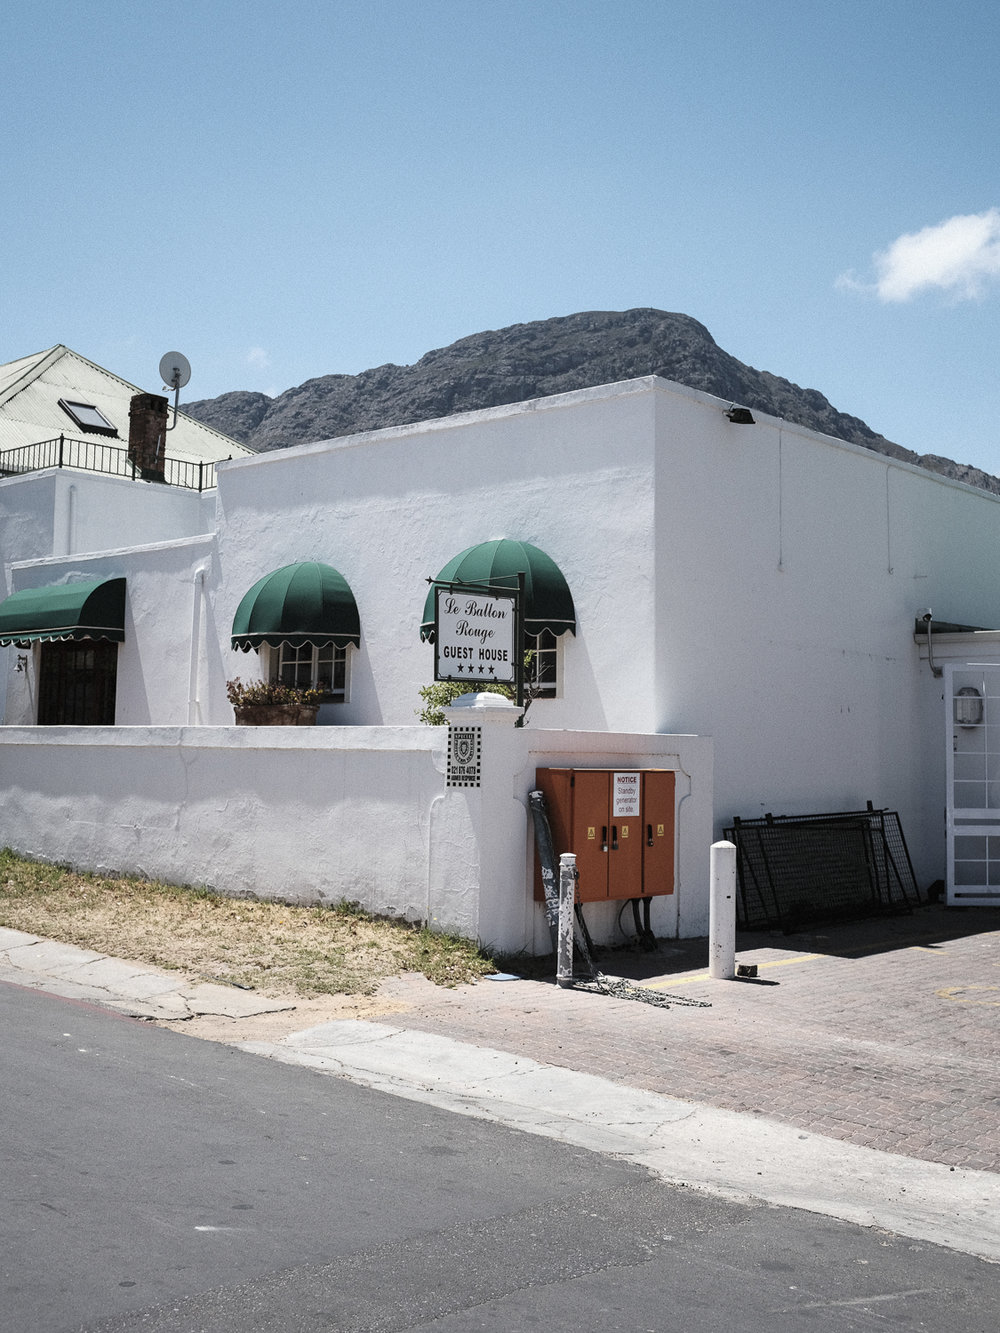 cape-town-south-africa-franschhoek-village-15.jpg